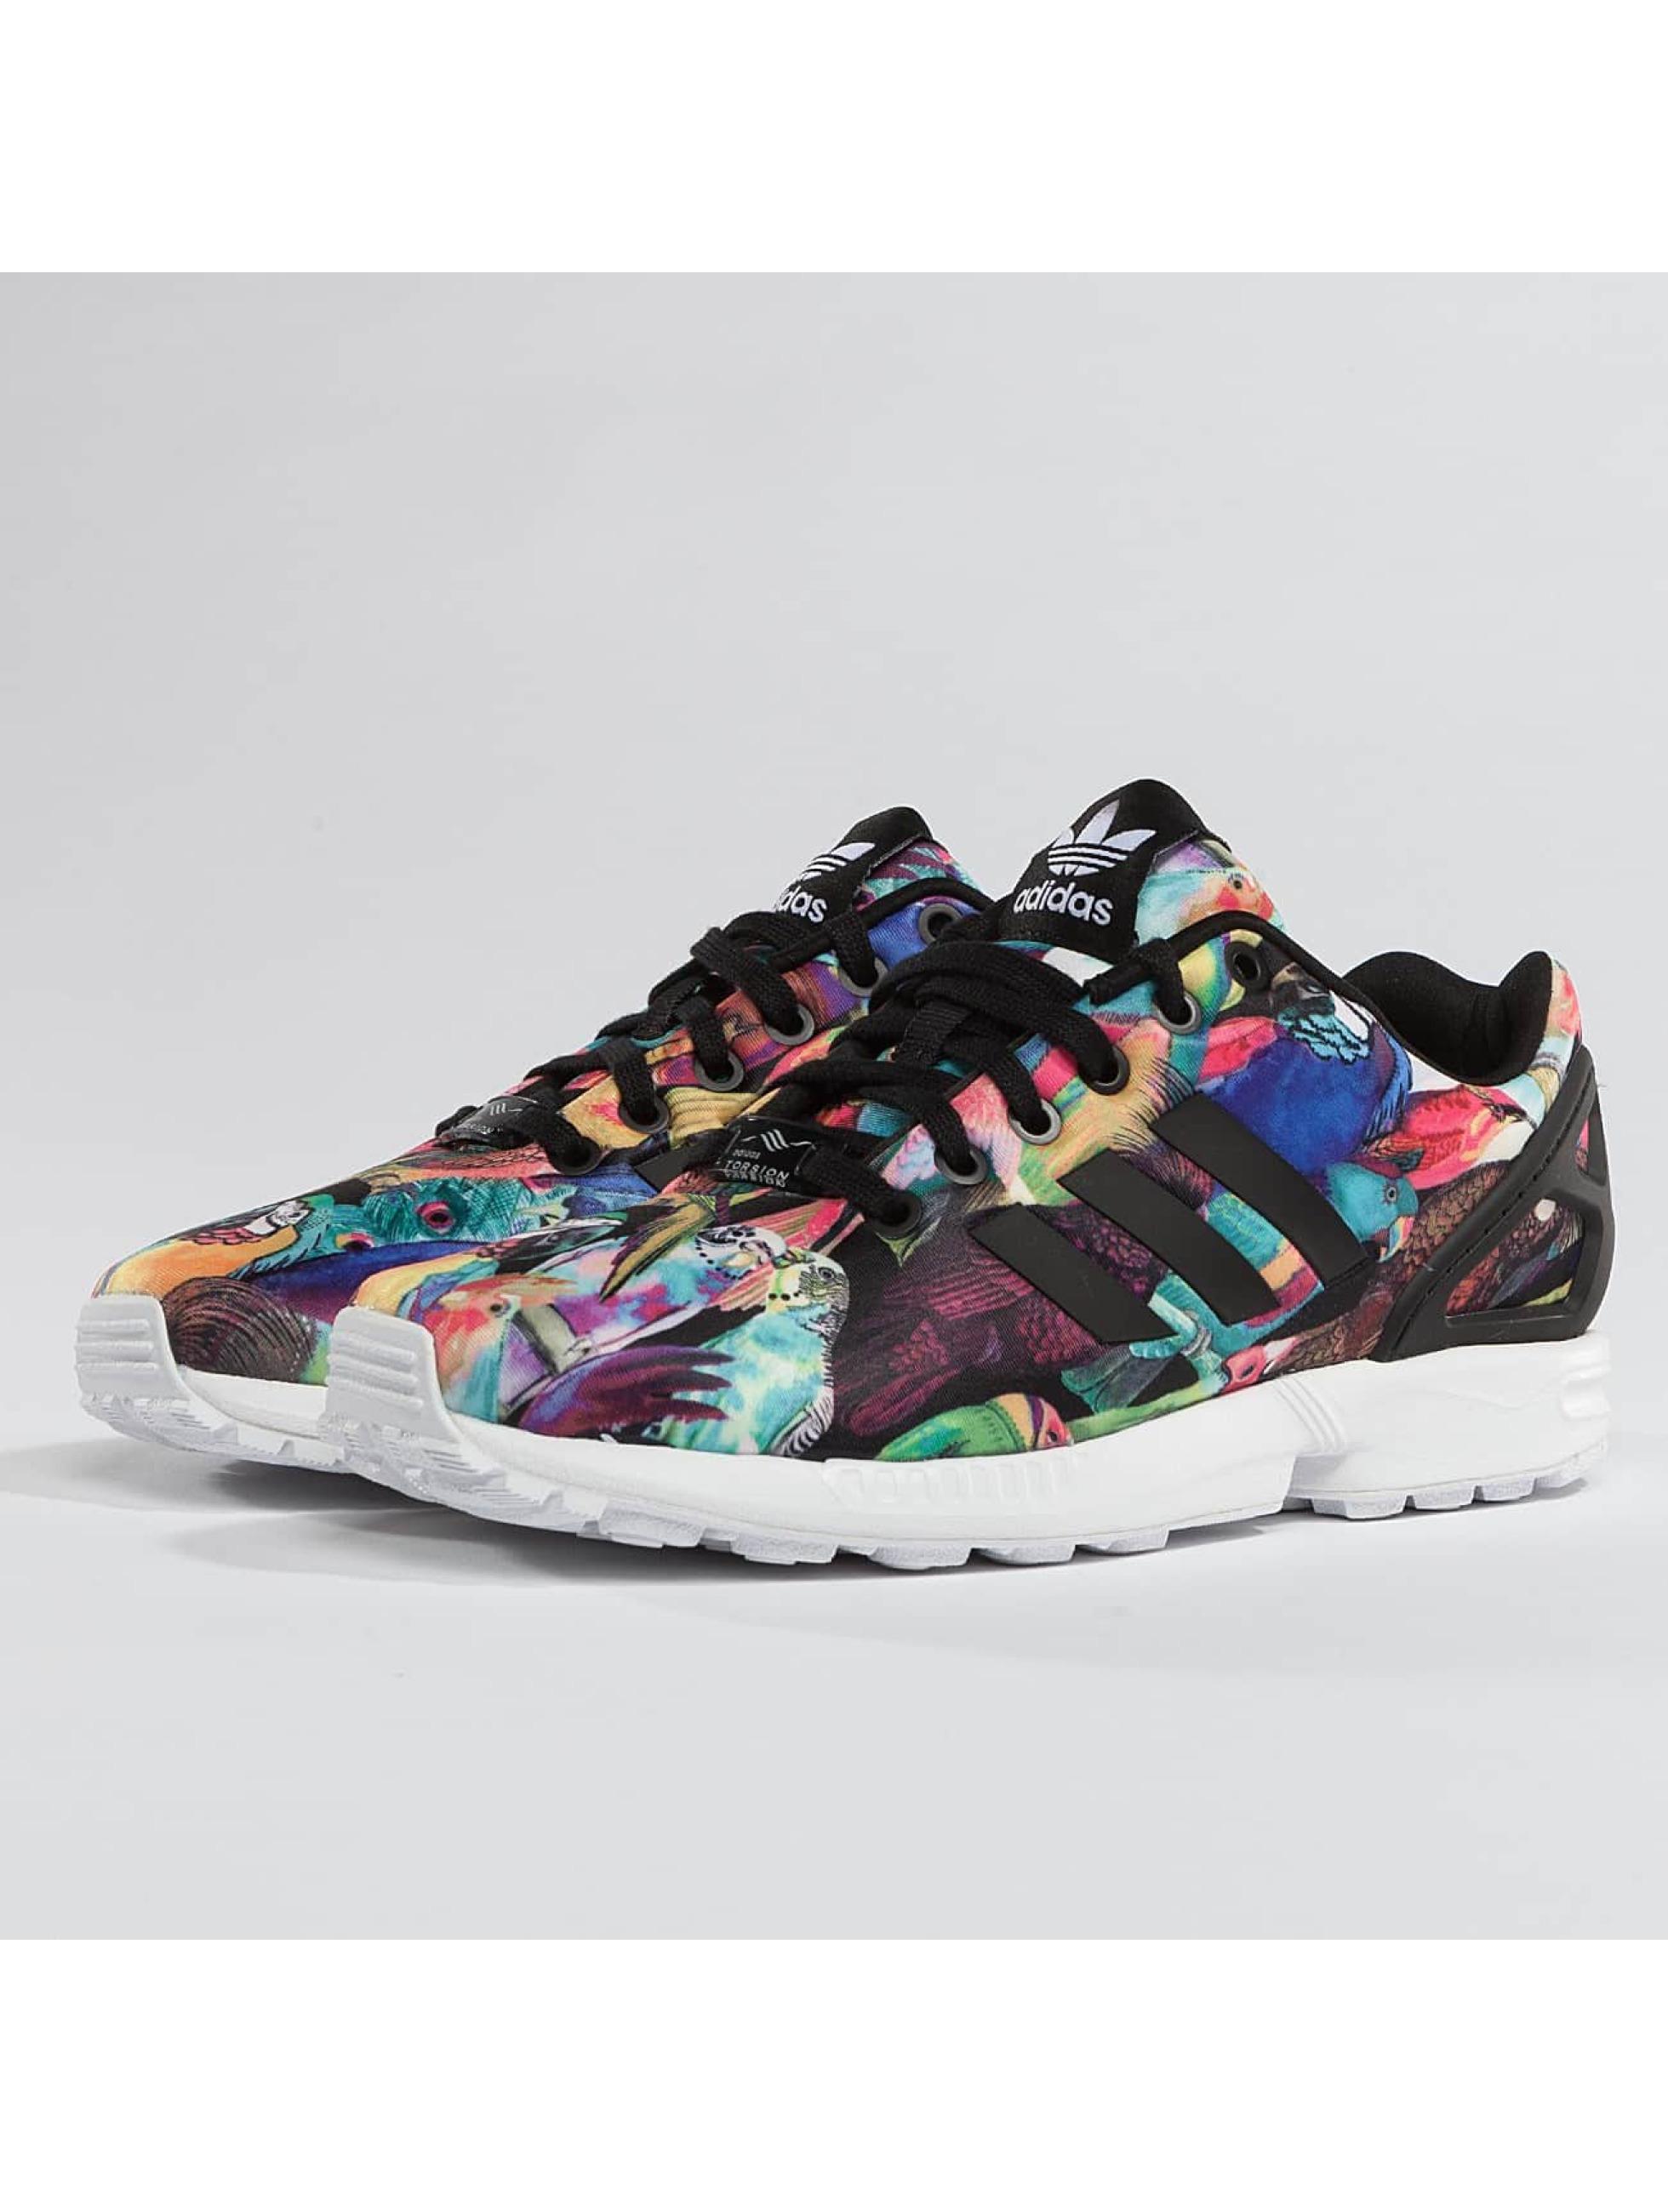 adidas schoen sneaker zx flux in bont 359748. Black Bedroom Furniture Sets. Home Design Ideas